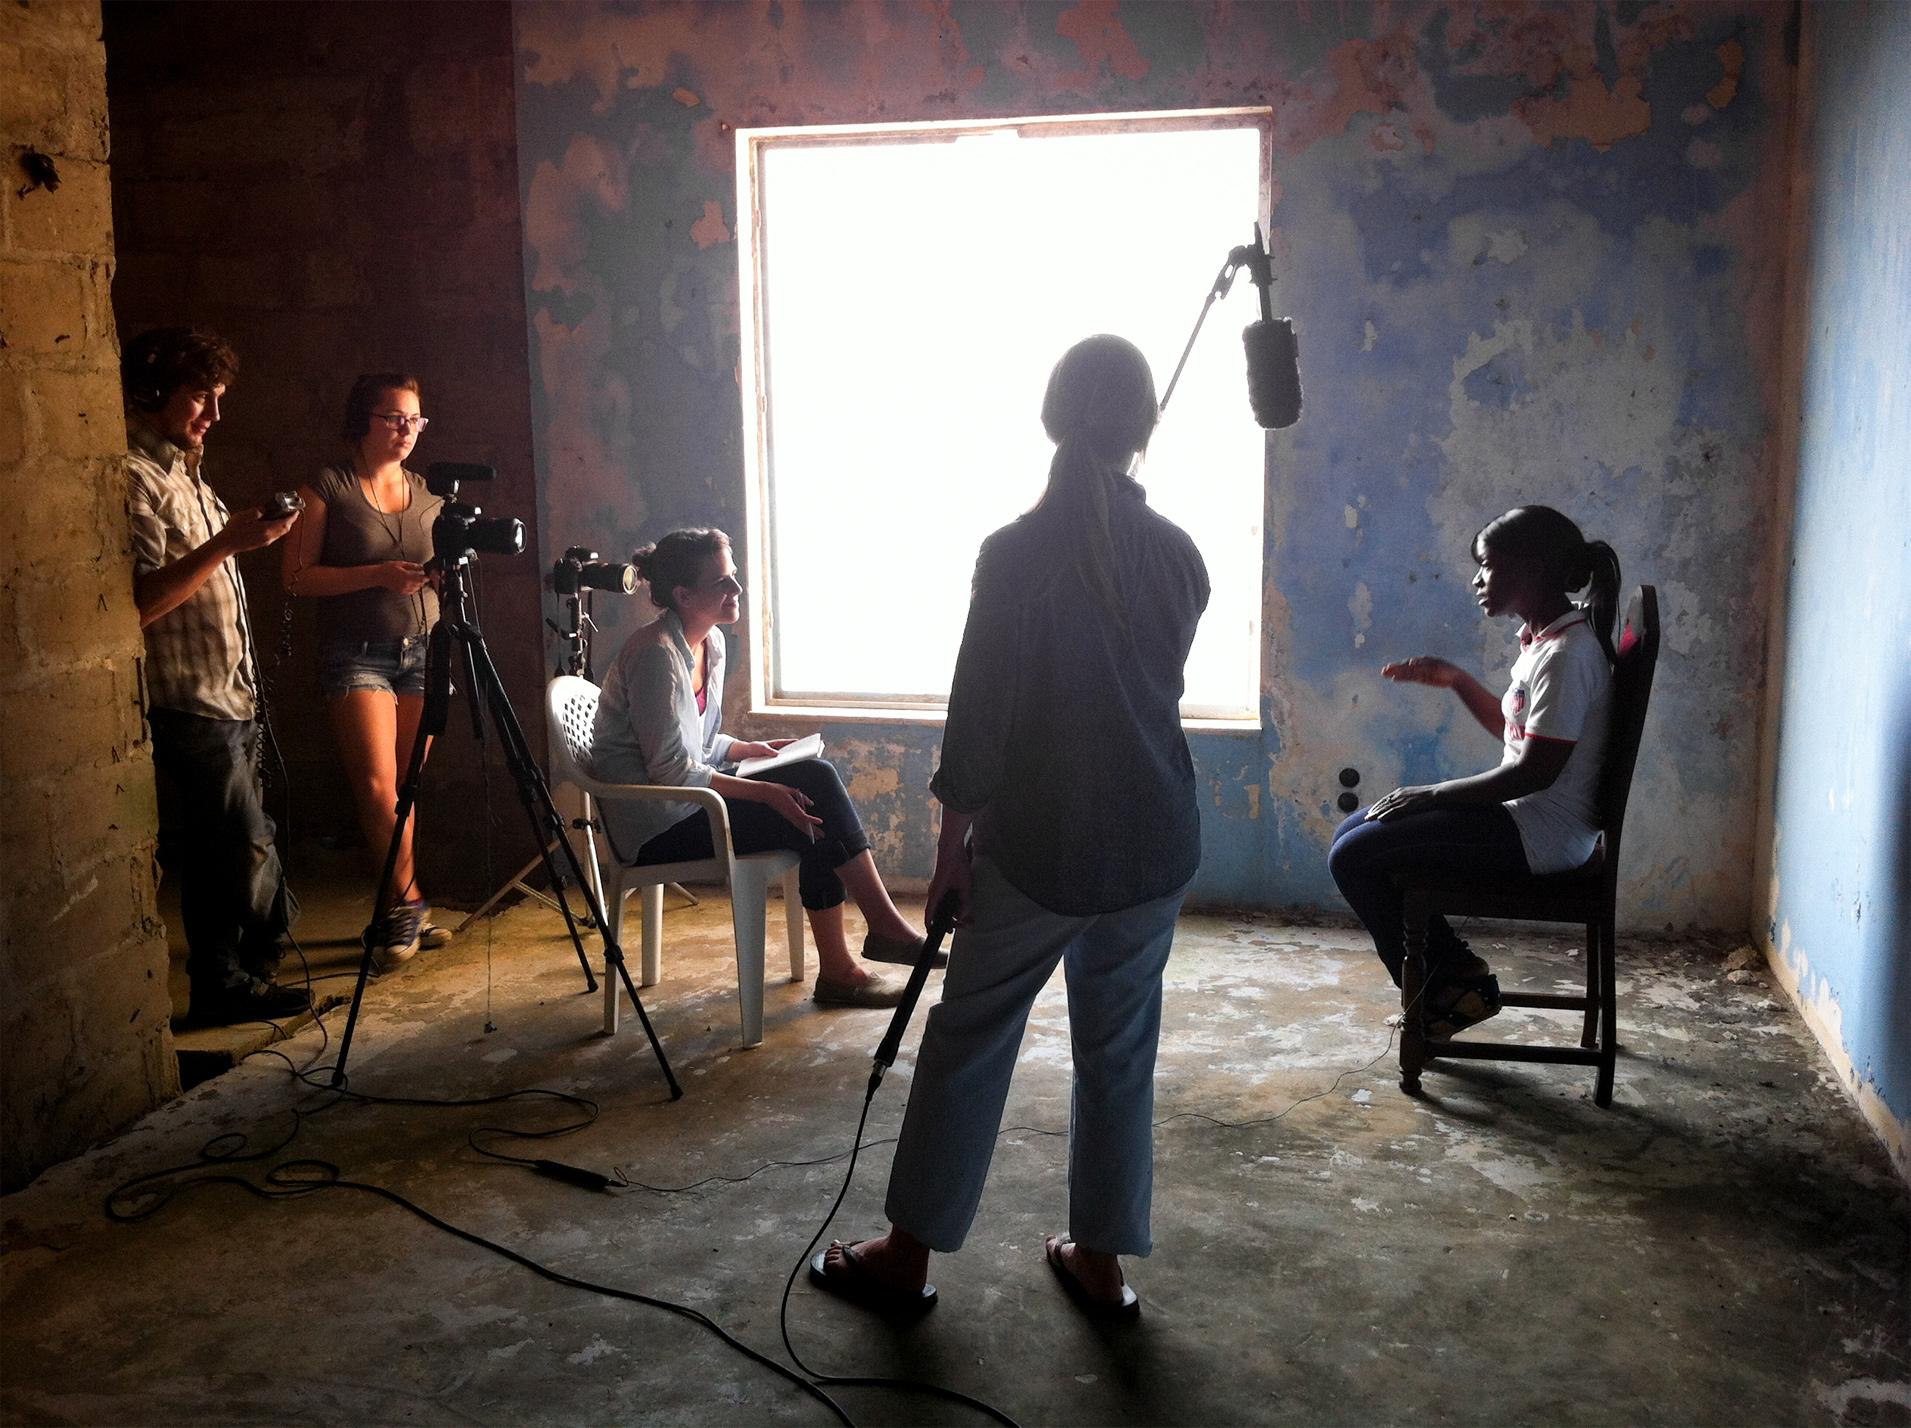 (L to R) Students Jim Tuttle, Kristina Subsara, Jessica Suarez and journalist Clair MacDougall interview Liberian journalist Tecee Boley in Monrovia, Liberia.